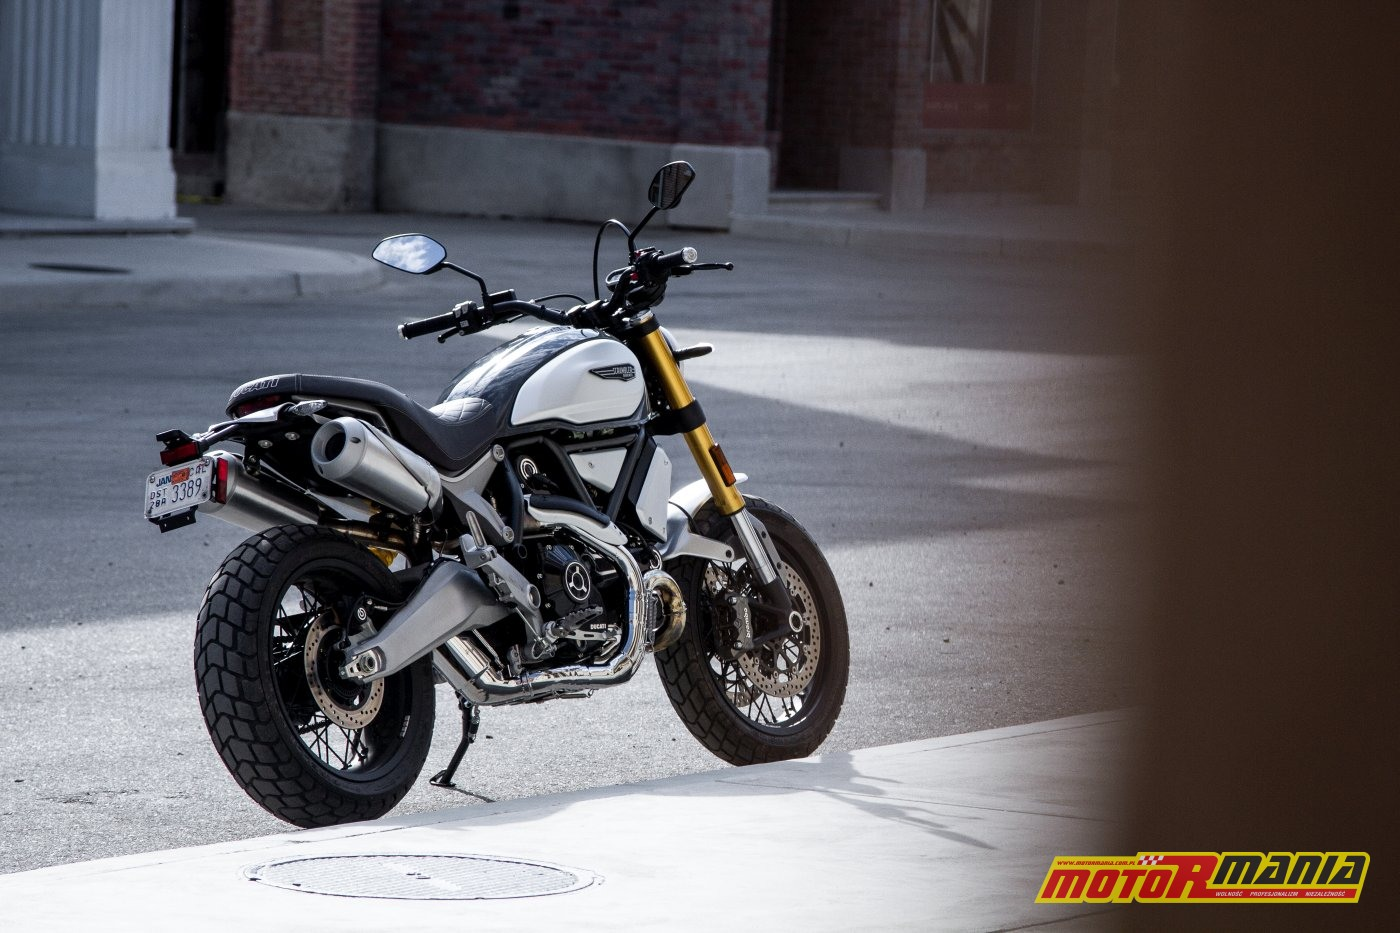 Scrambler 1100 Special - Ducati 2018 (1)